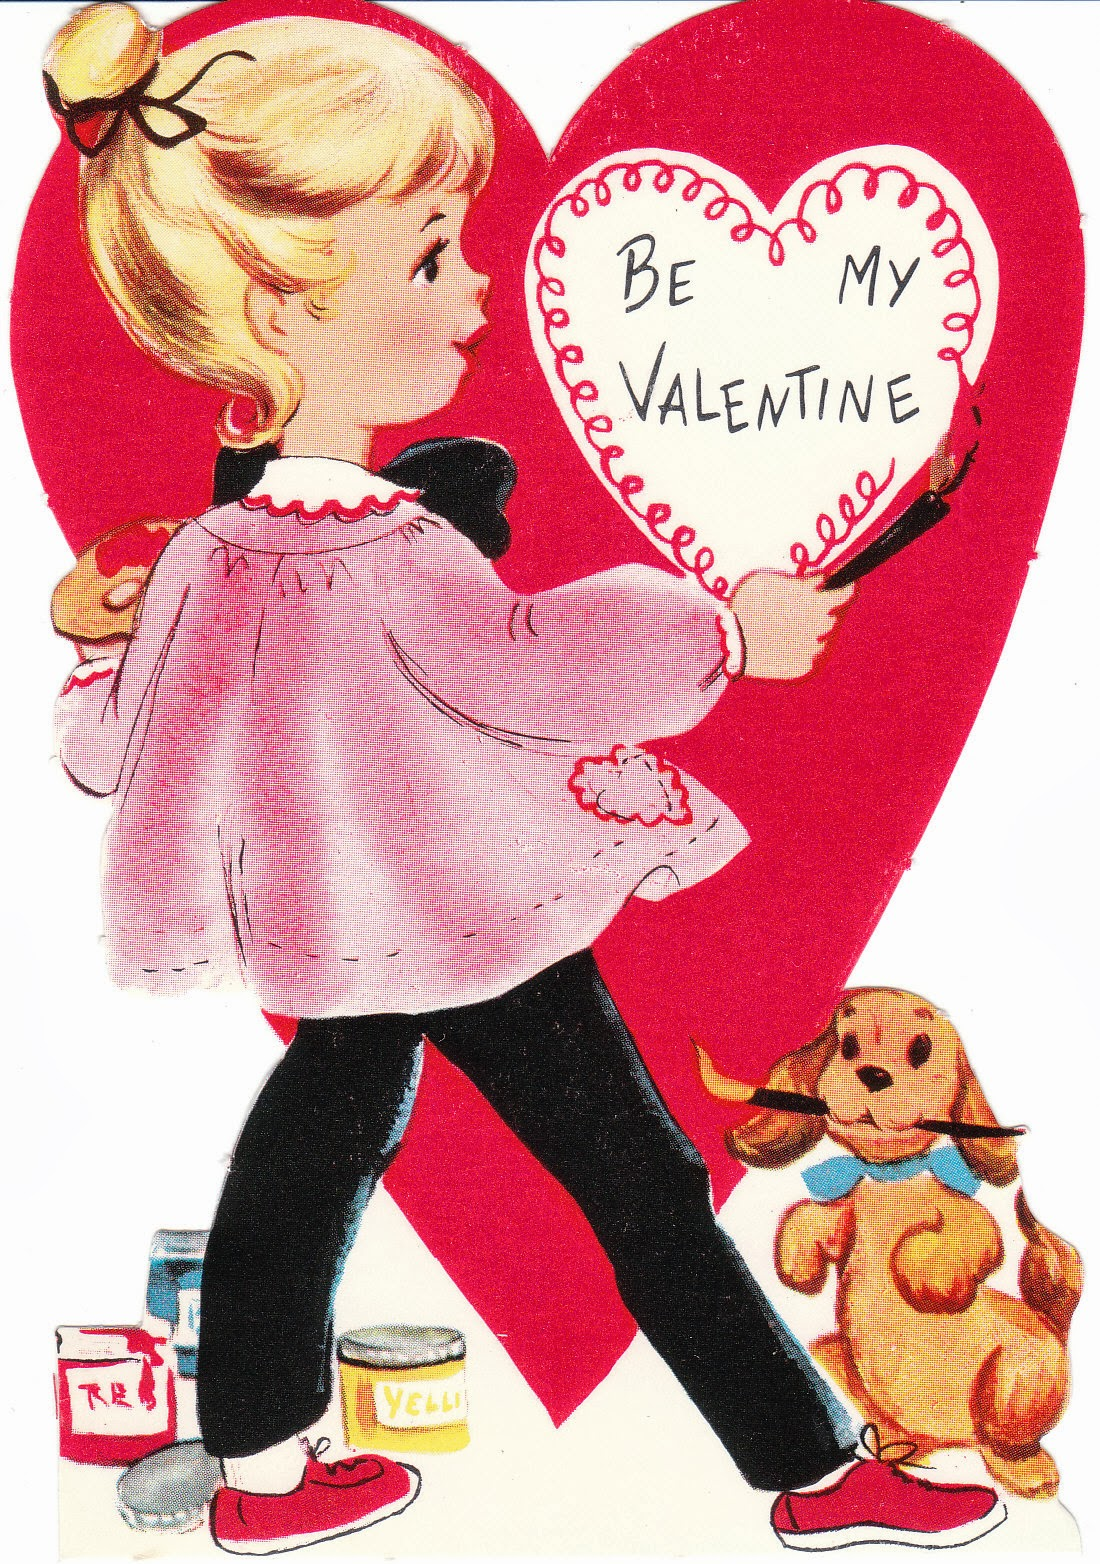 mamasVIB | V. I. BUSY BEES: HAPPY VALENTINE'S DAY! ❤ ❤ ❤ | HAPPY VALENTINE'S DAY! | mamasVIB | valentines day | vintage valentines card